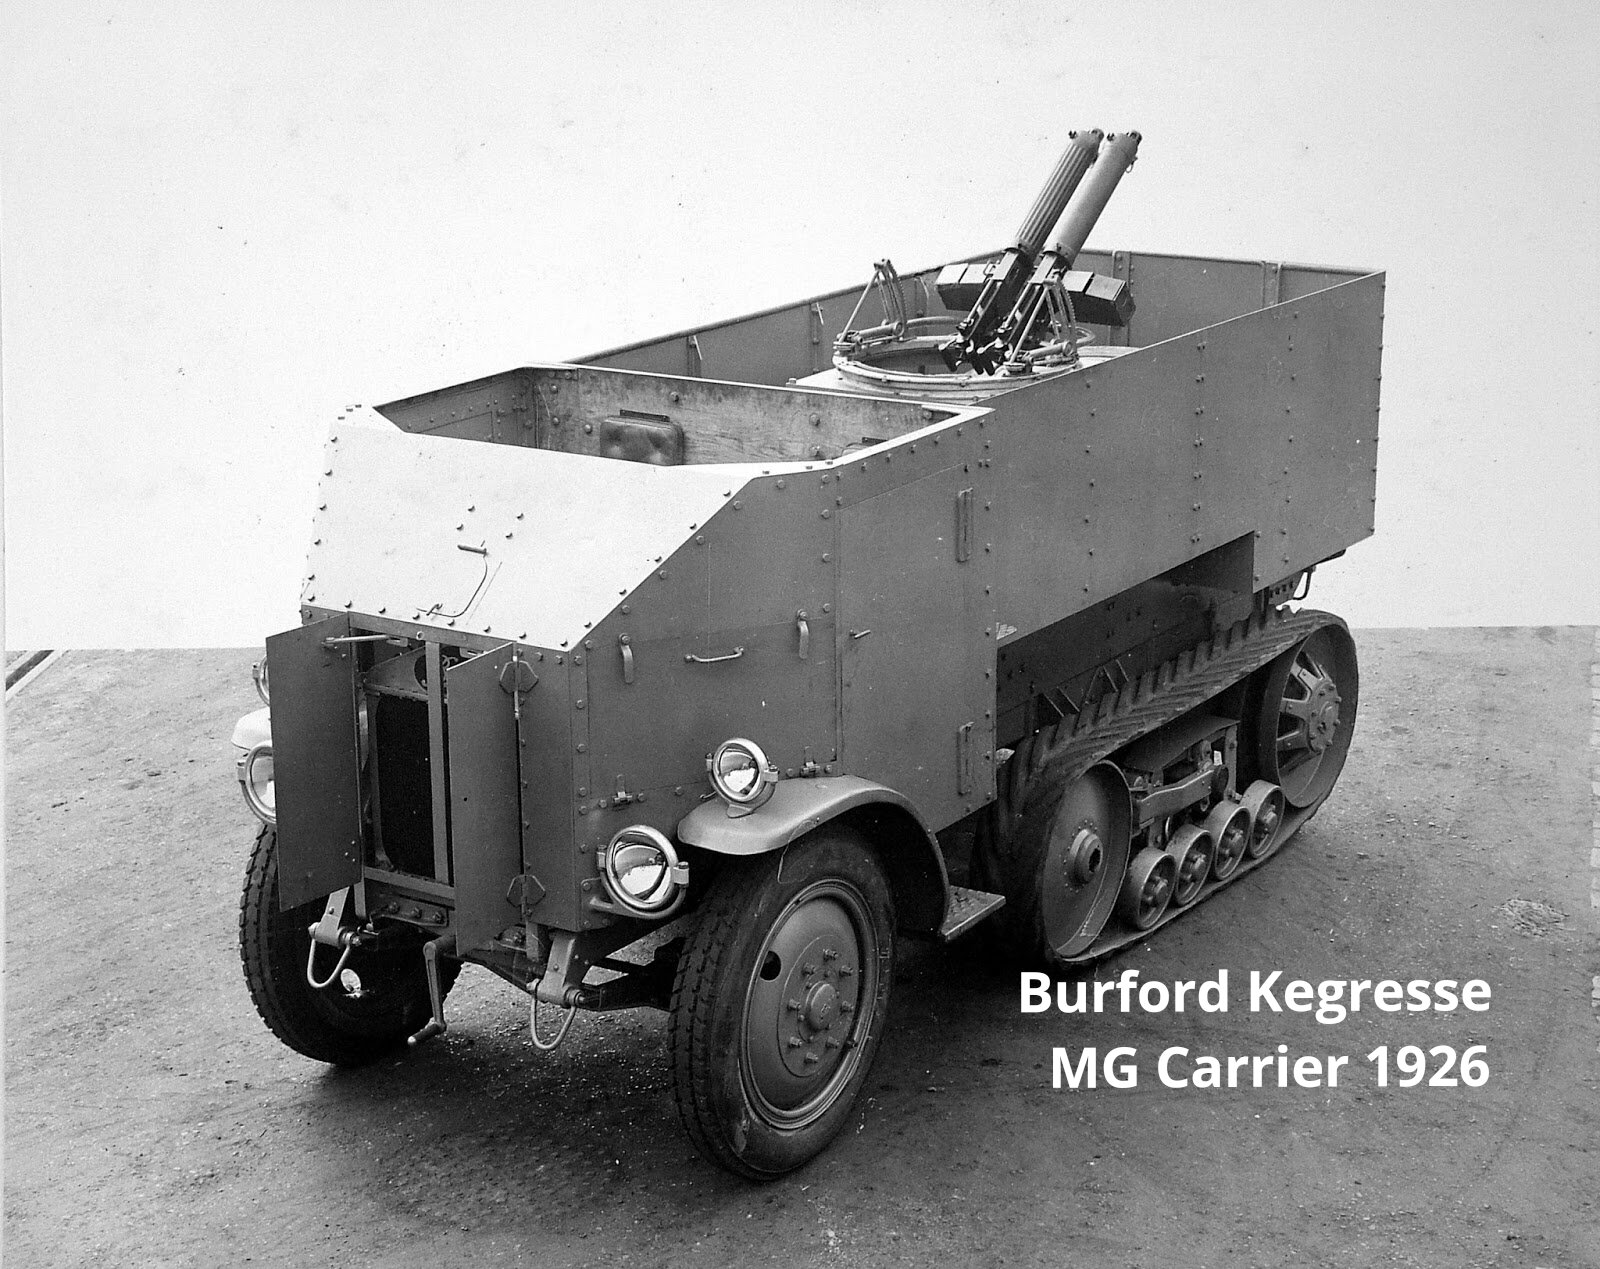 52 Burford Kegresse MG Carrier_kindlephoto-311698.jpg